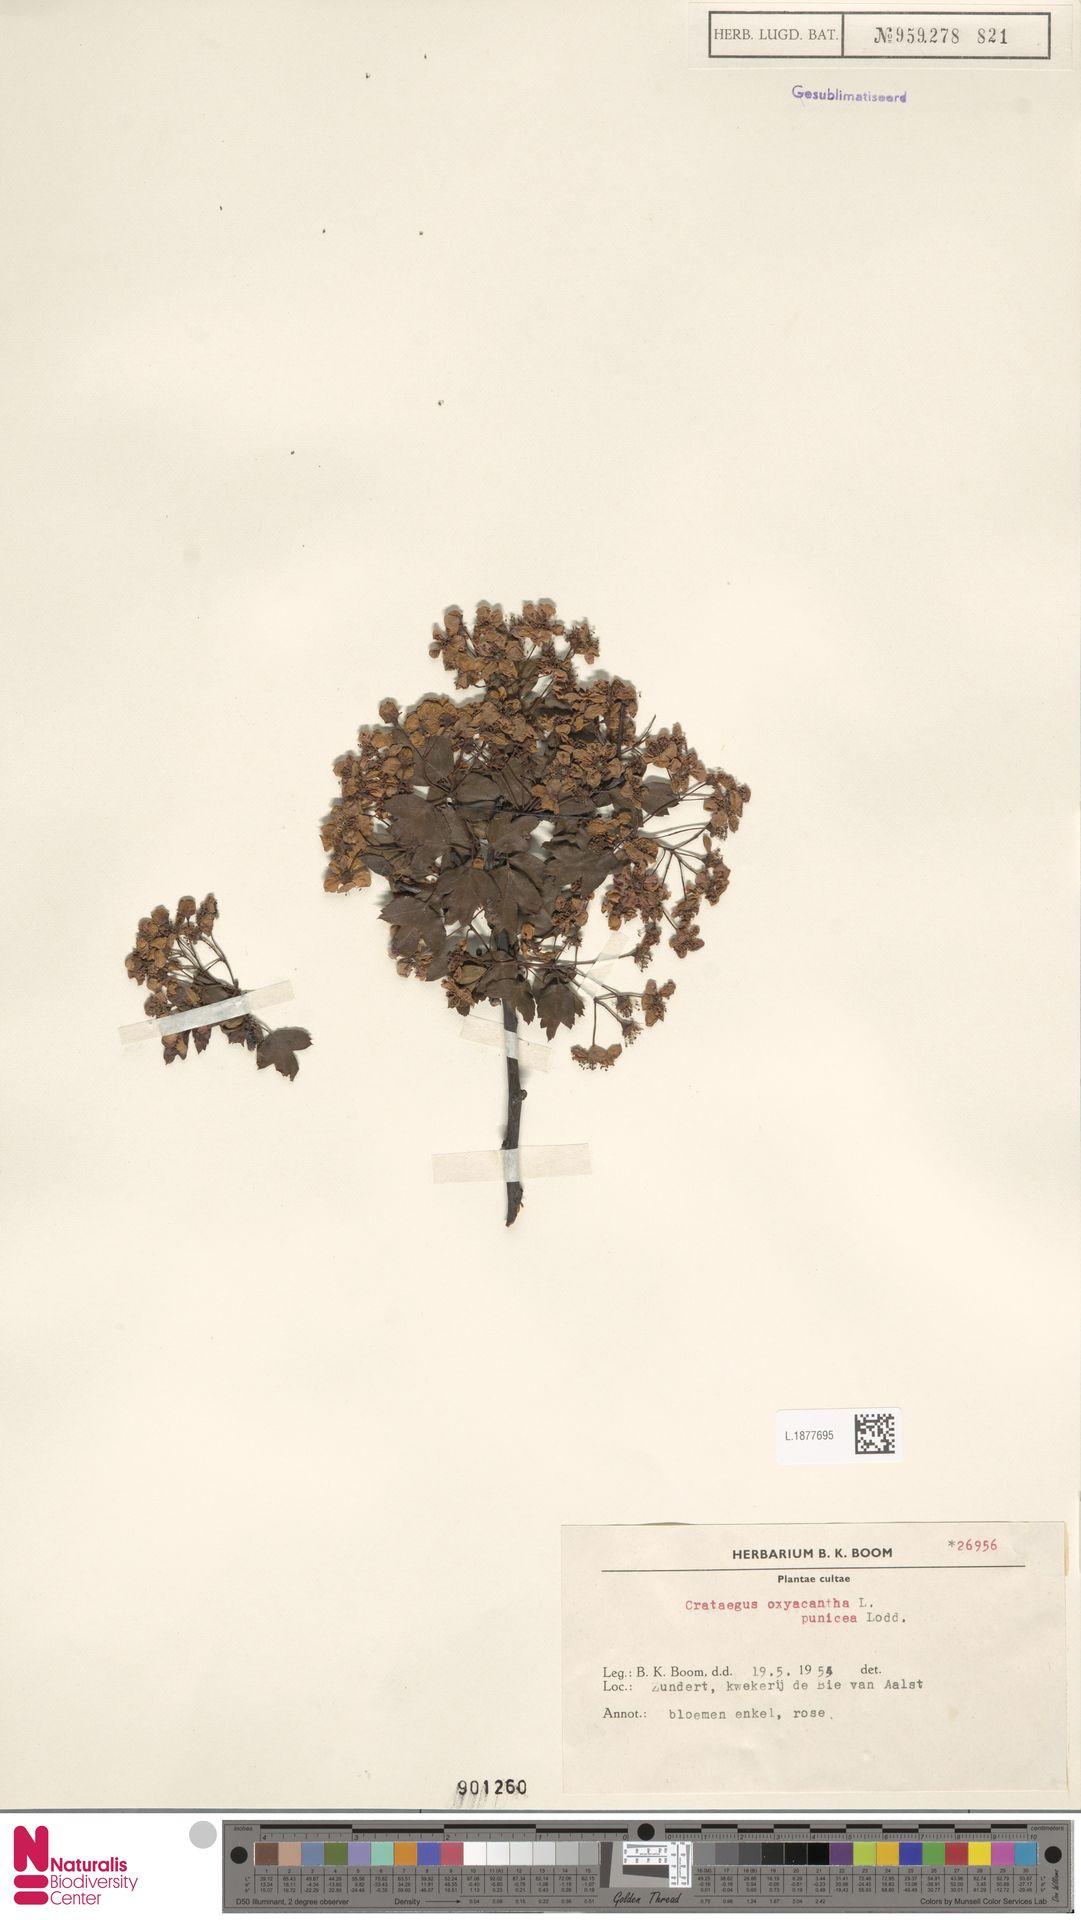 L.1877695 | Crataegus oxyacantha var. punicea Lodd.